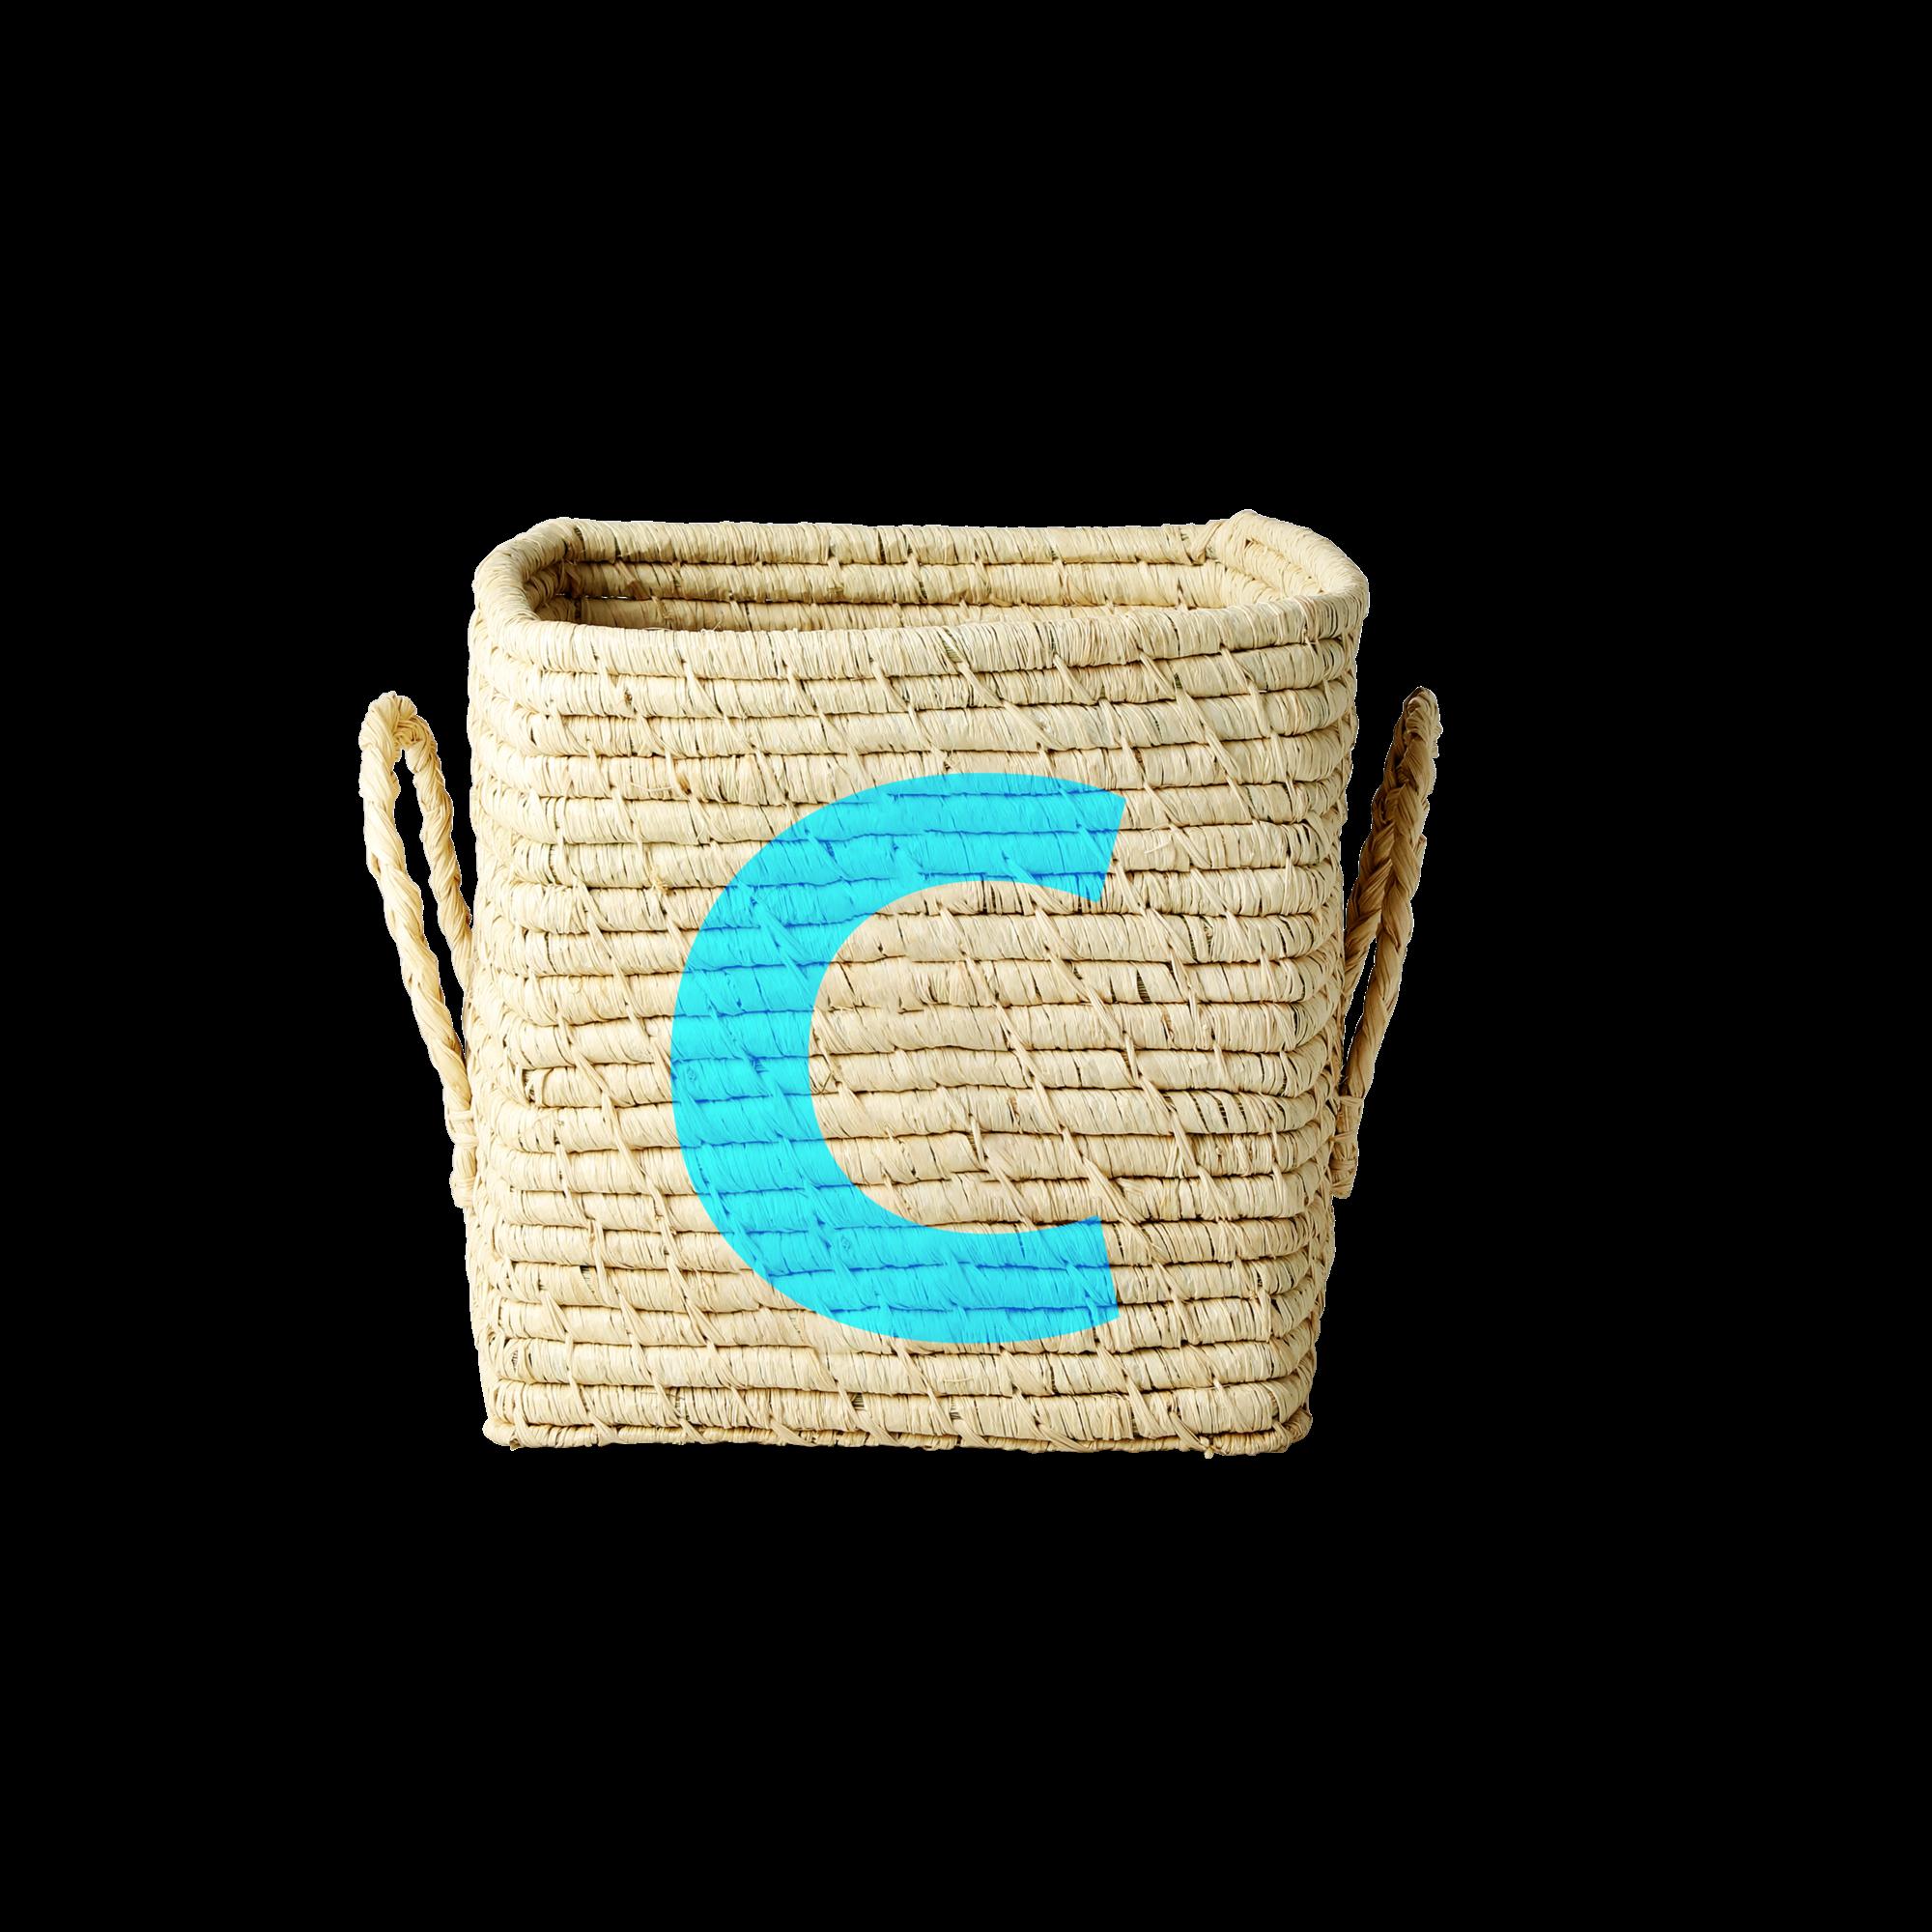 Rice - Raffia Square Basket w. Painted Letter - C